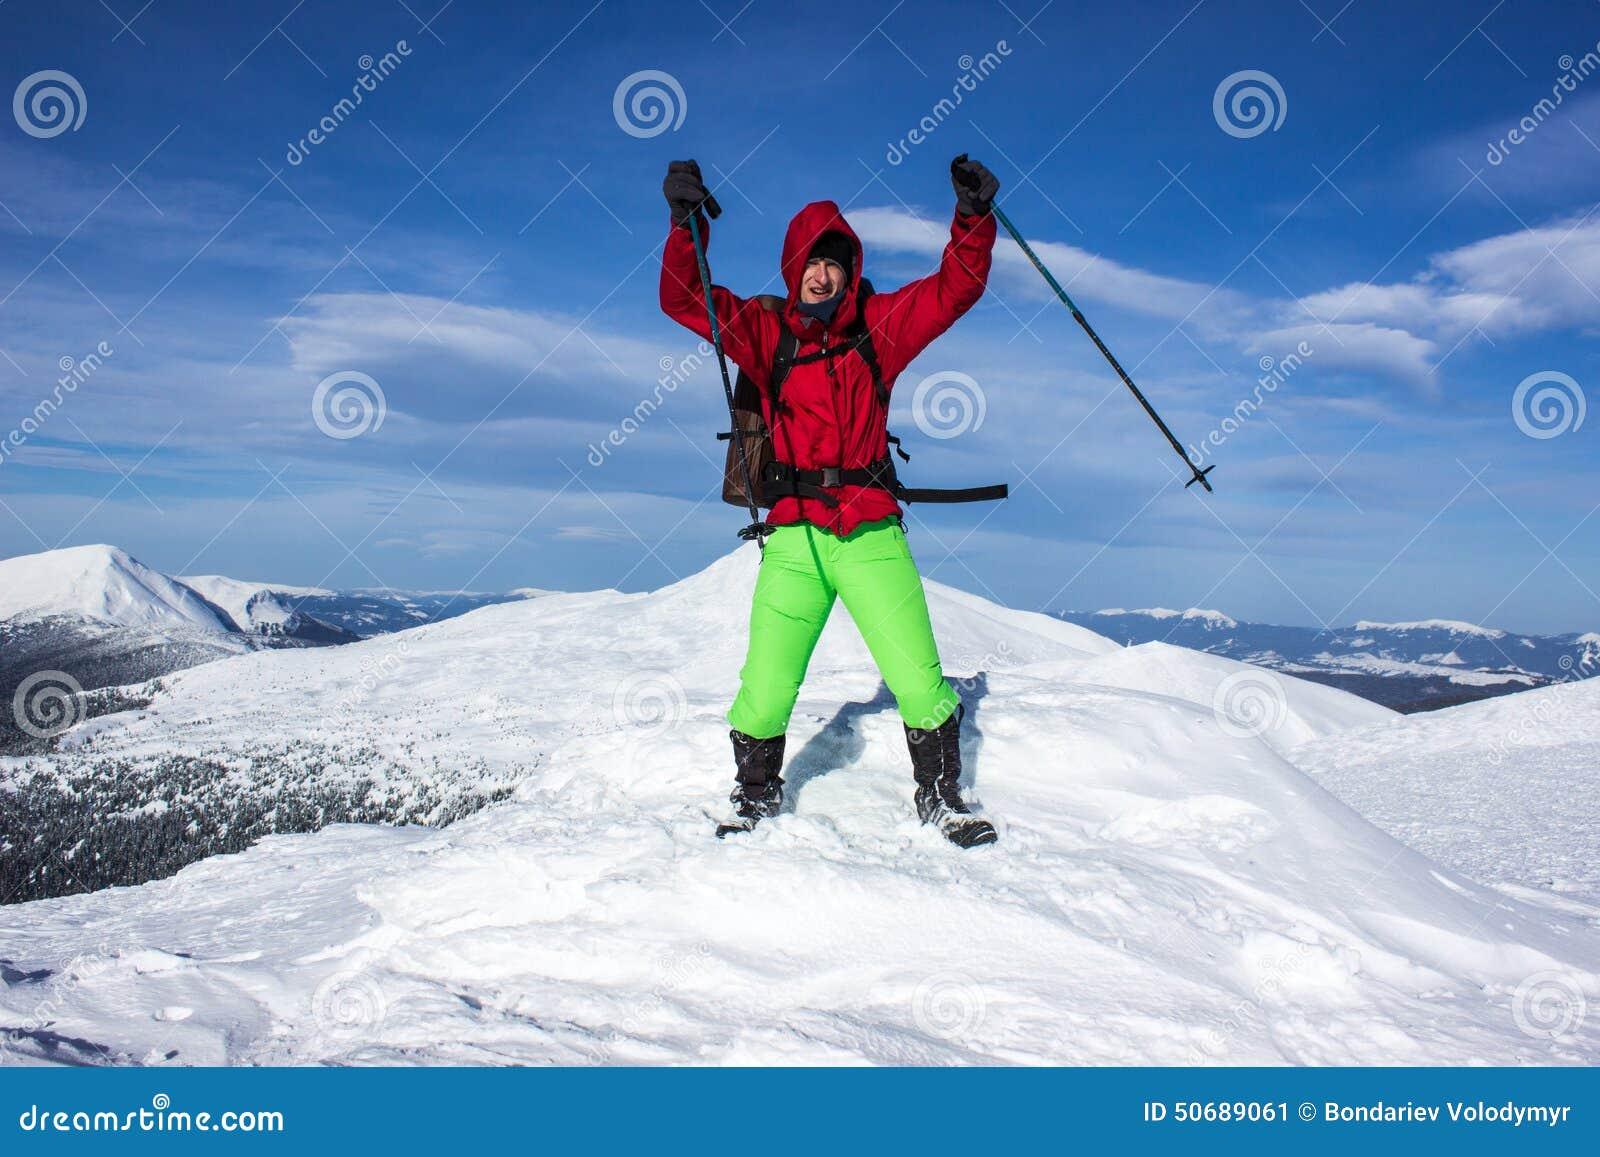 Download 远足在山的冬天 库存图片. 图片 包括有 天空, 多雪, 空间, 室外, 目标, 雪靴, 能源, 人们, 风险 - 50689061